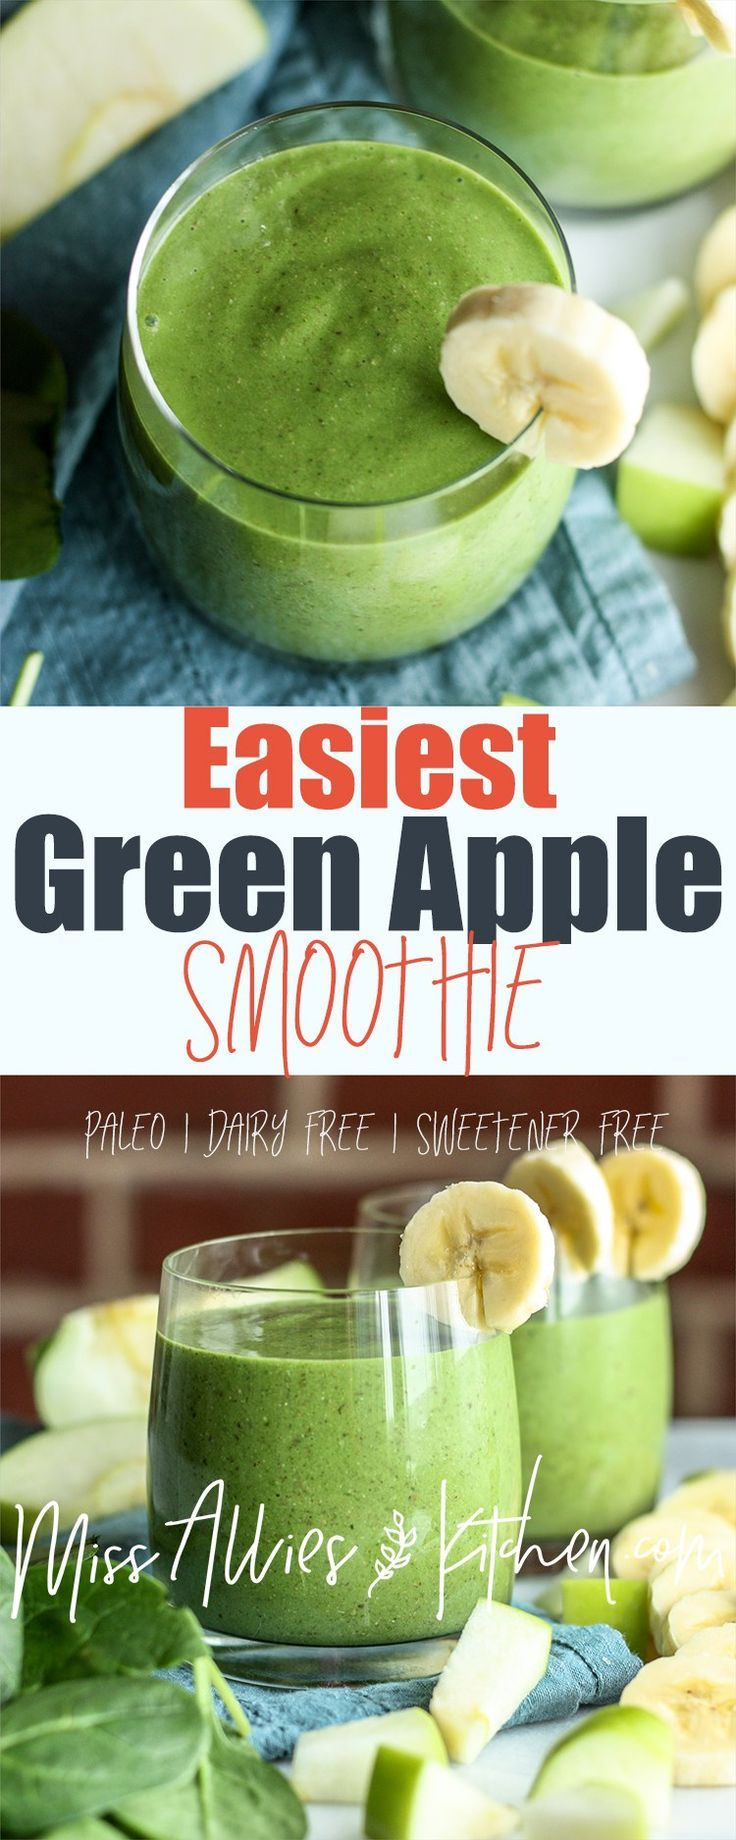 Easiest Green Apple Smoothie